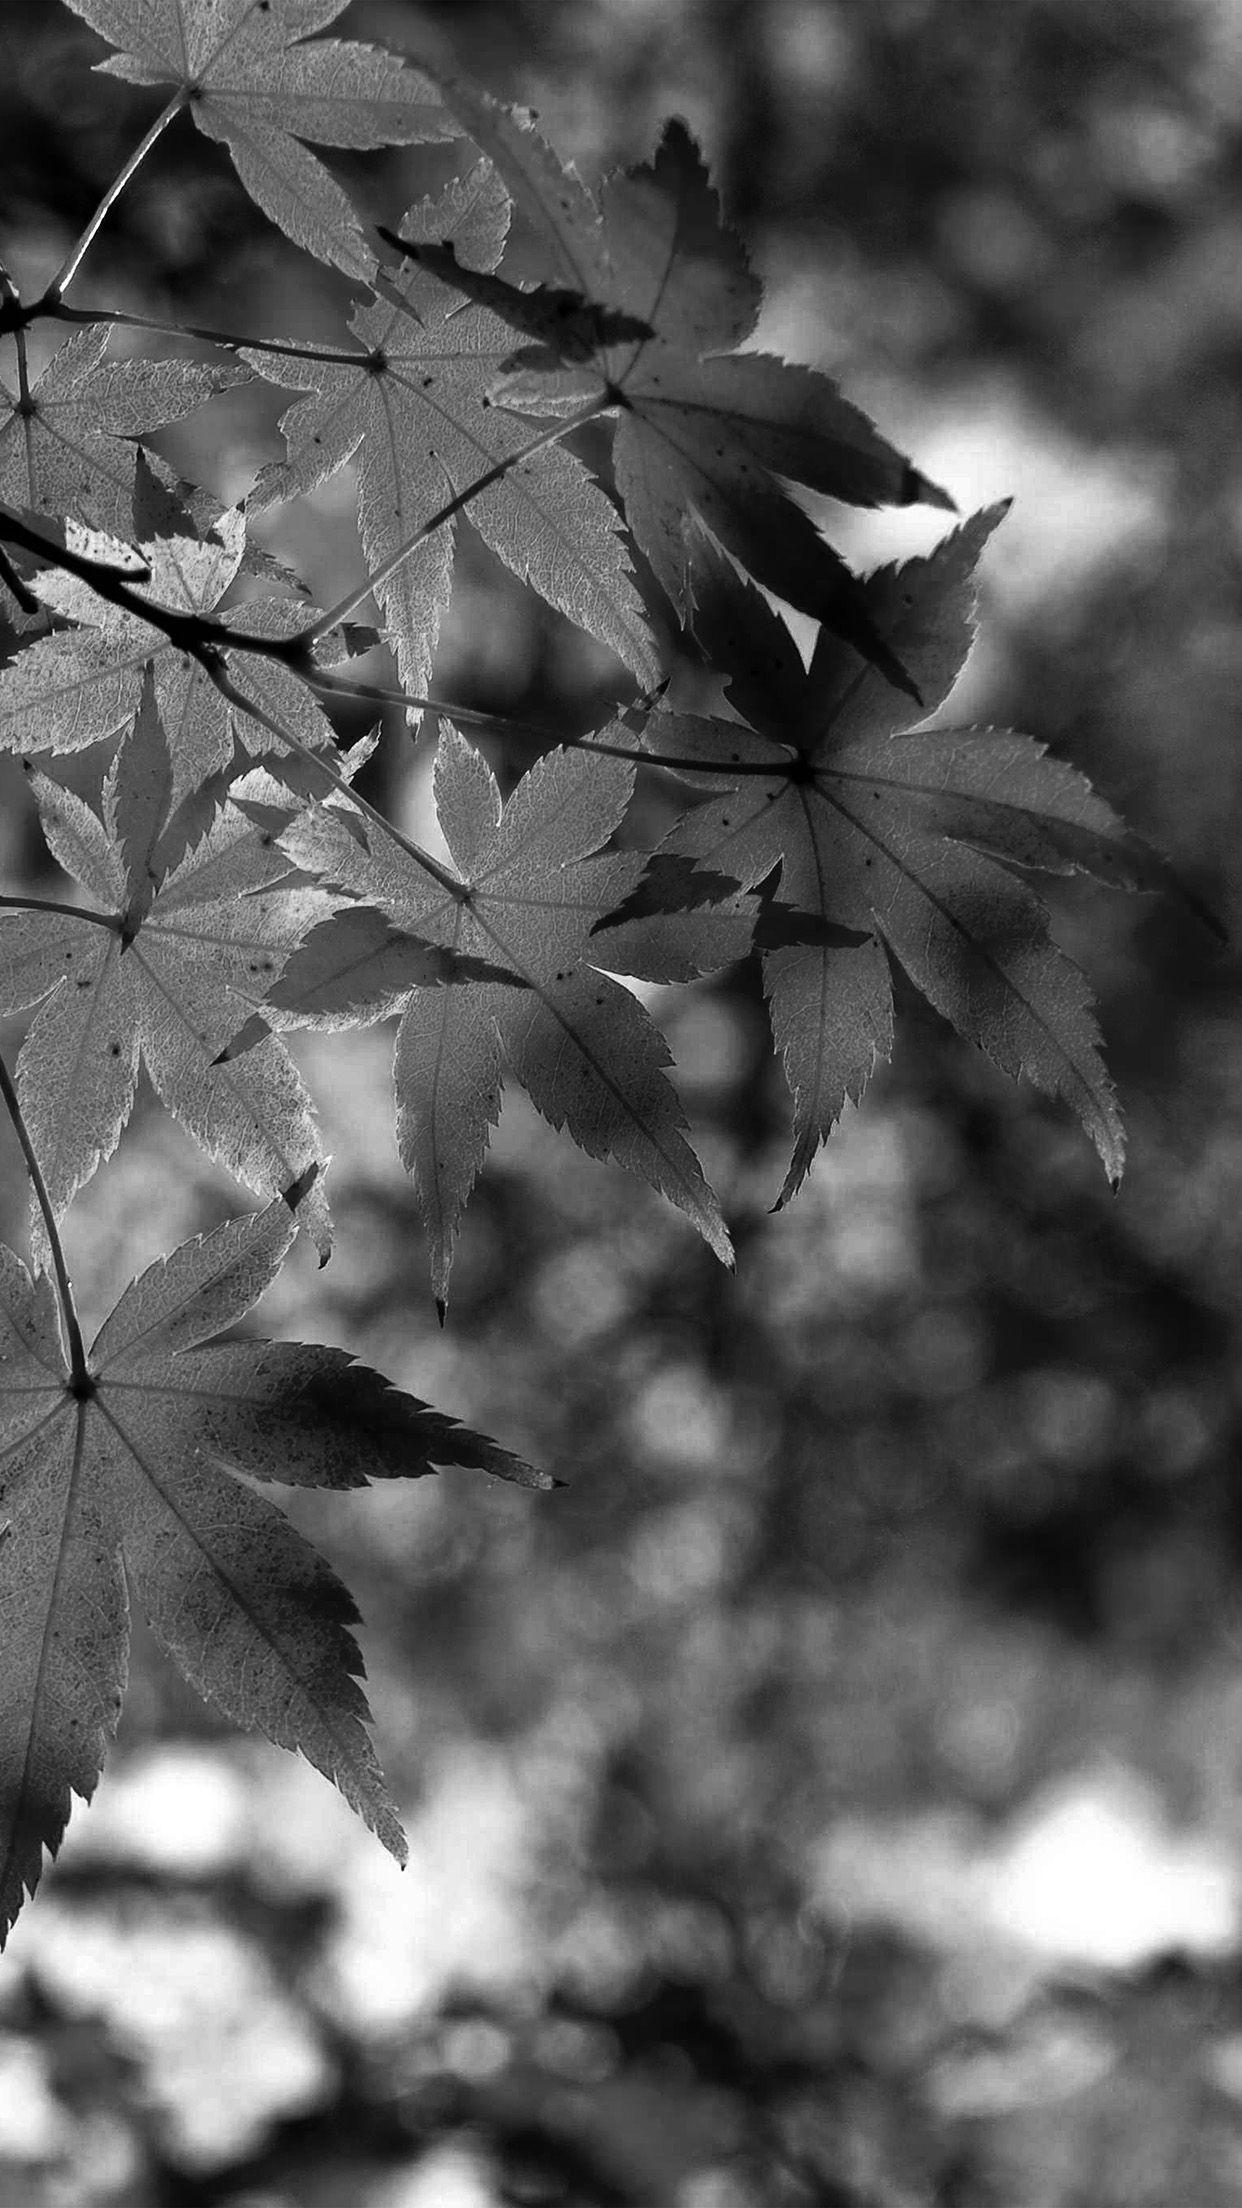 Fall Wallpaper Black 3d Wallpapers Fall Wallpaper Autumn Leaves Wallpaper Android Wallpaper